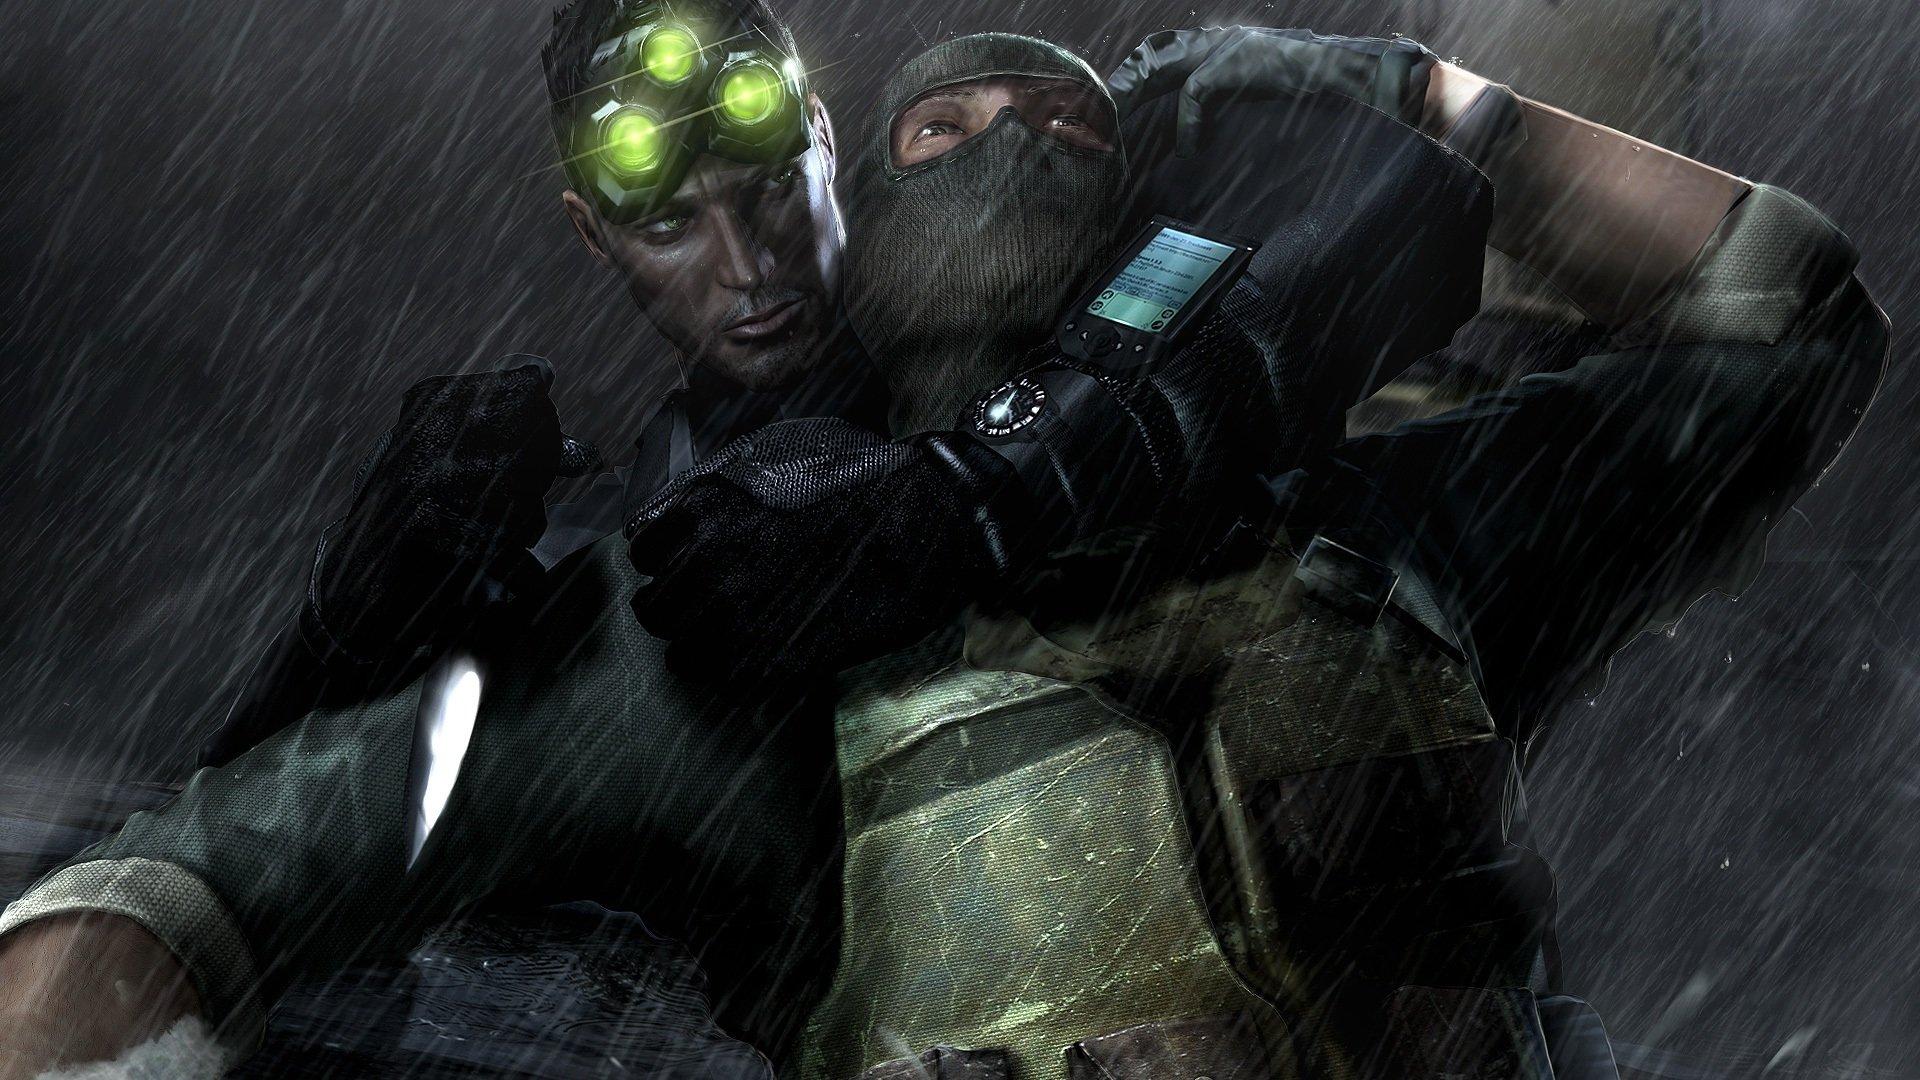 1. Splinter Cell: Chaos Theory